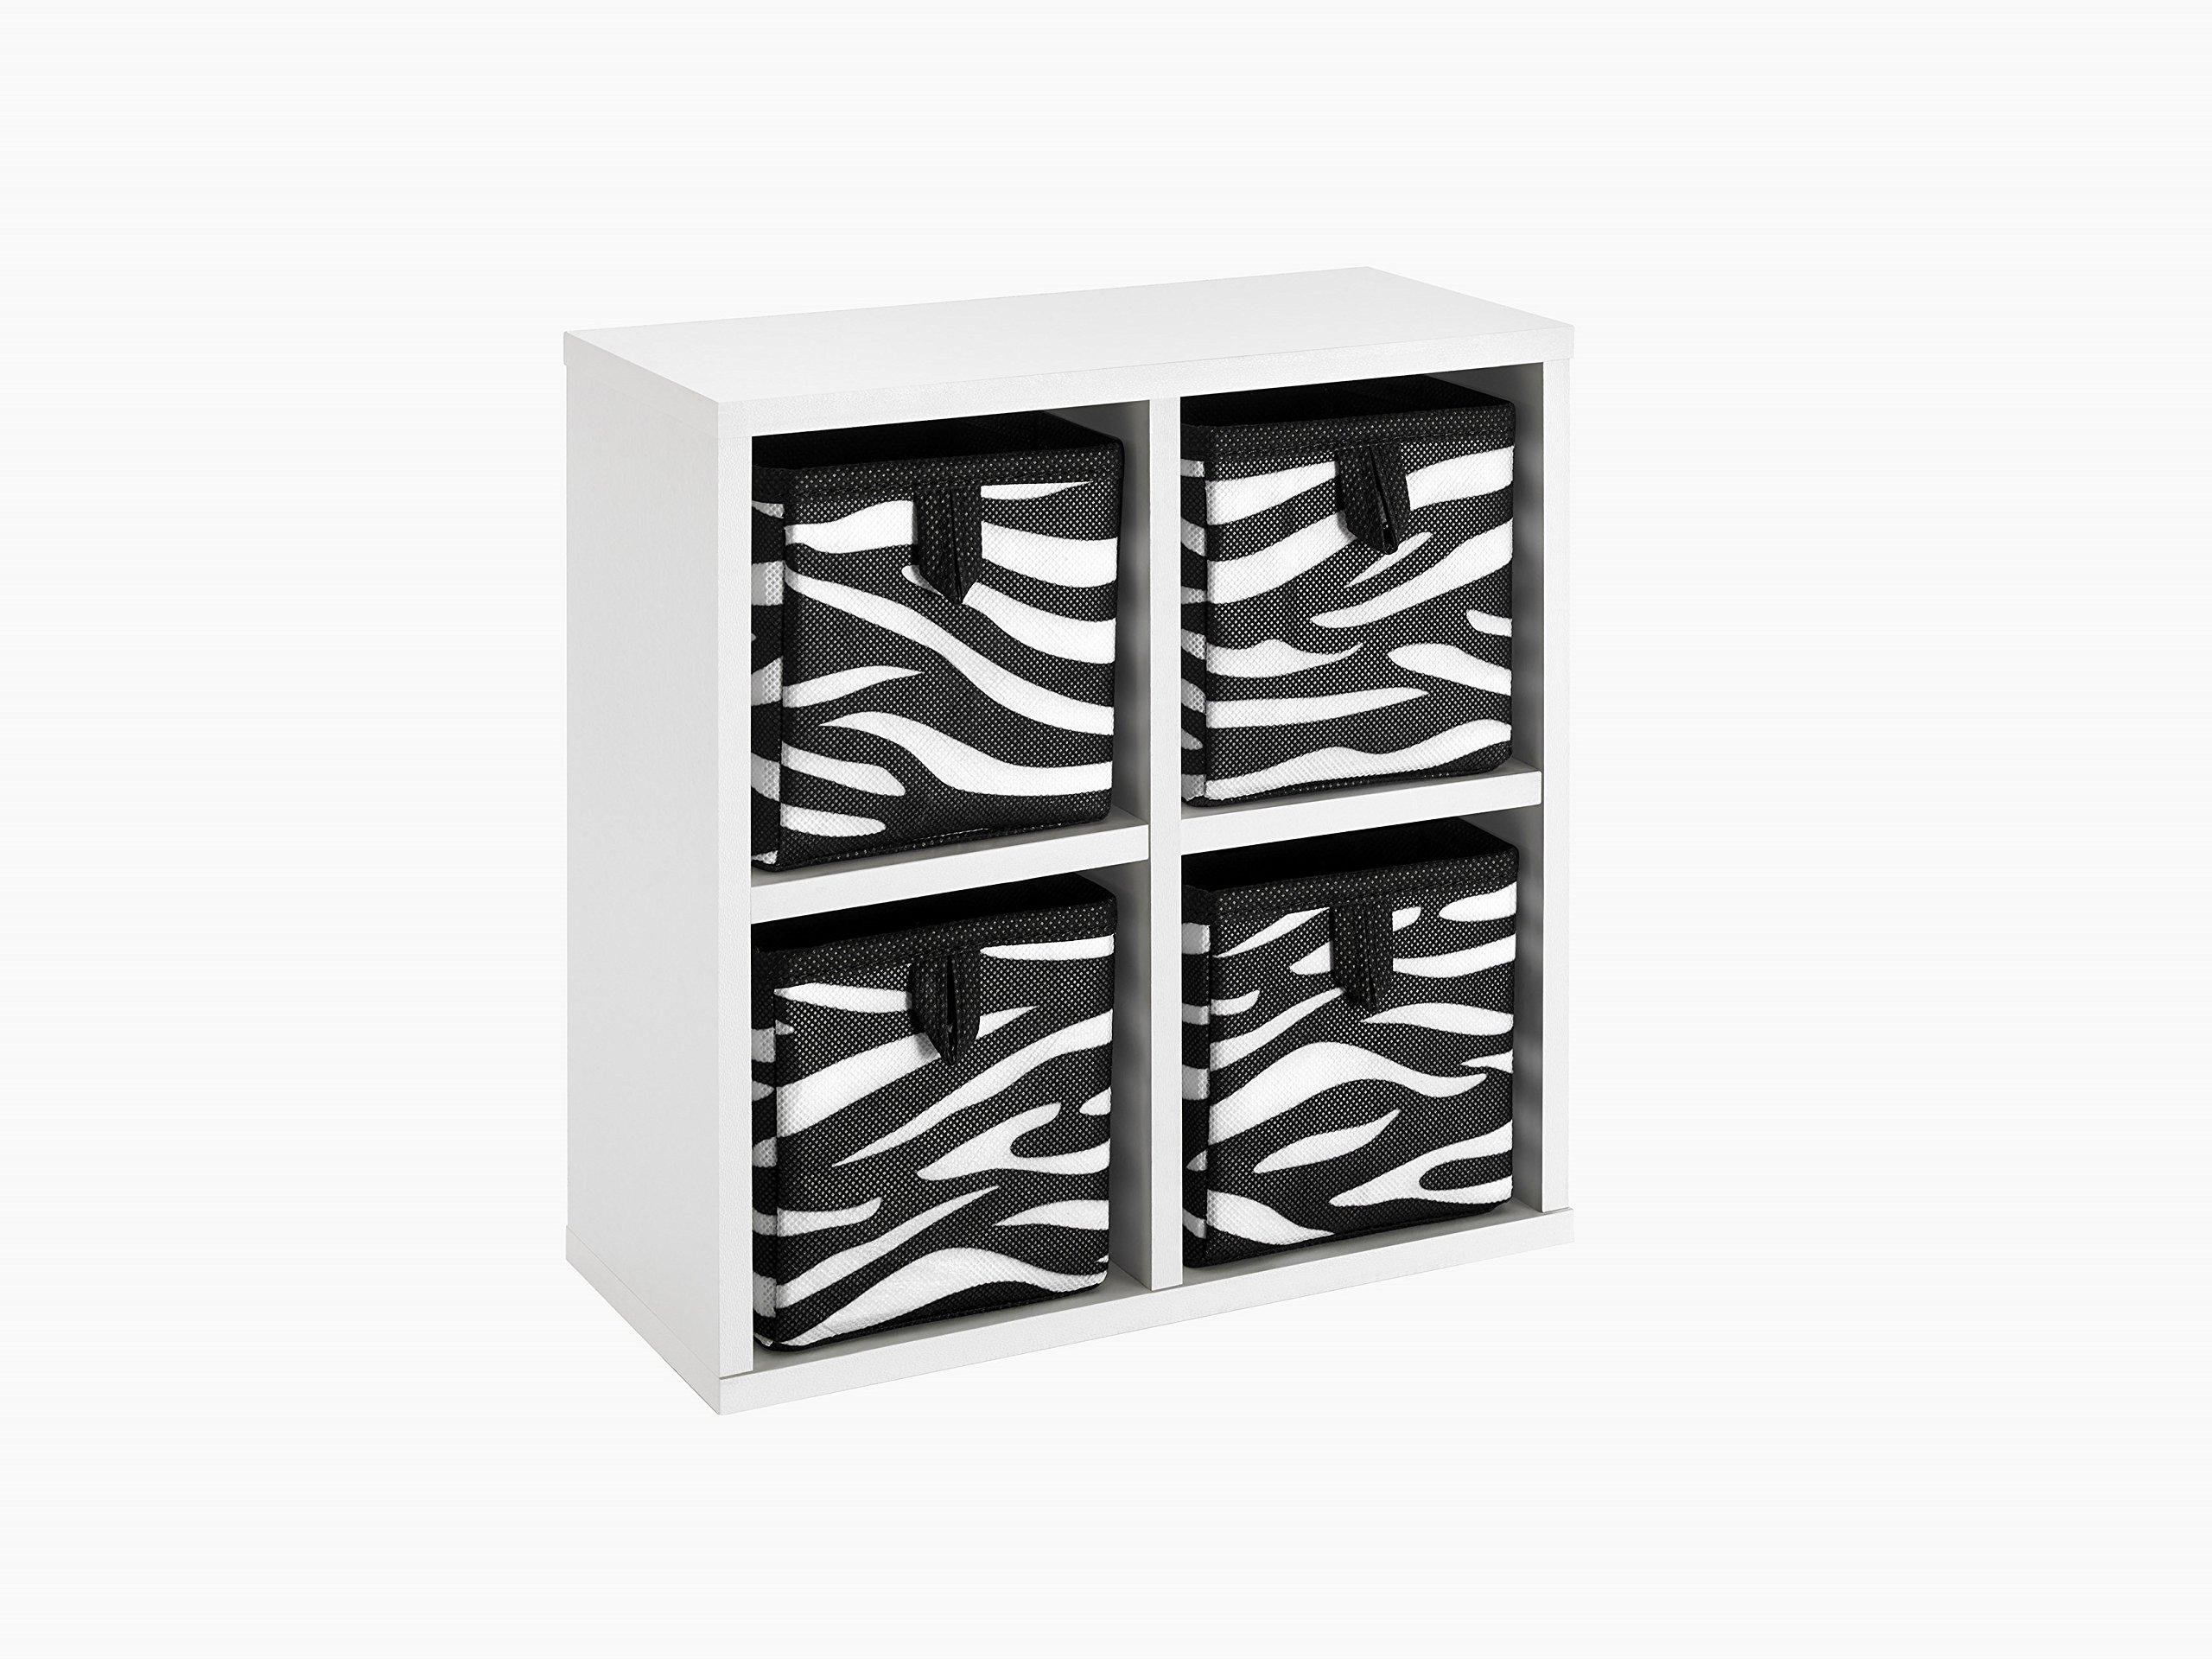 ClosetMaid 4431 Tiny 4-Cube Organizer with Four Zebra Pattern Bins